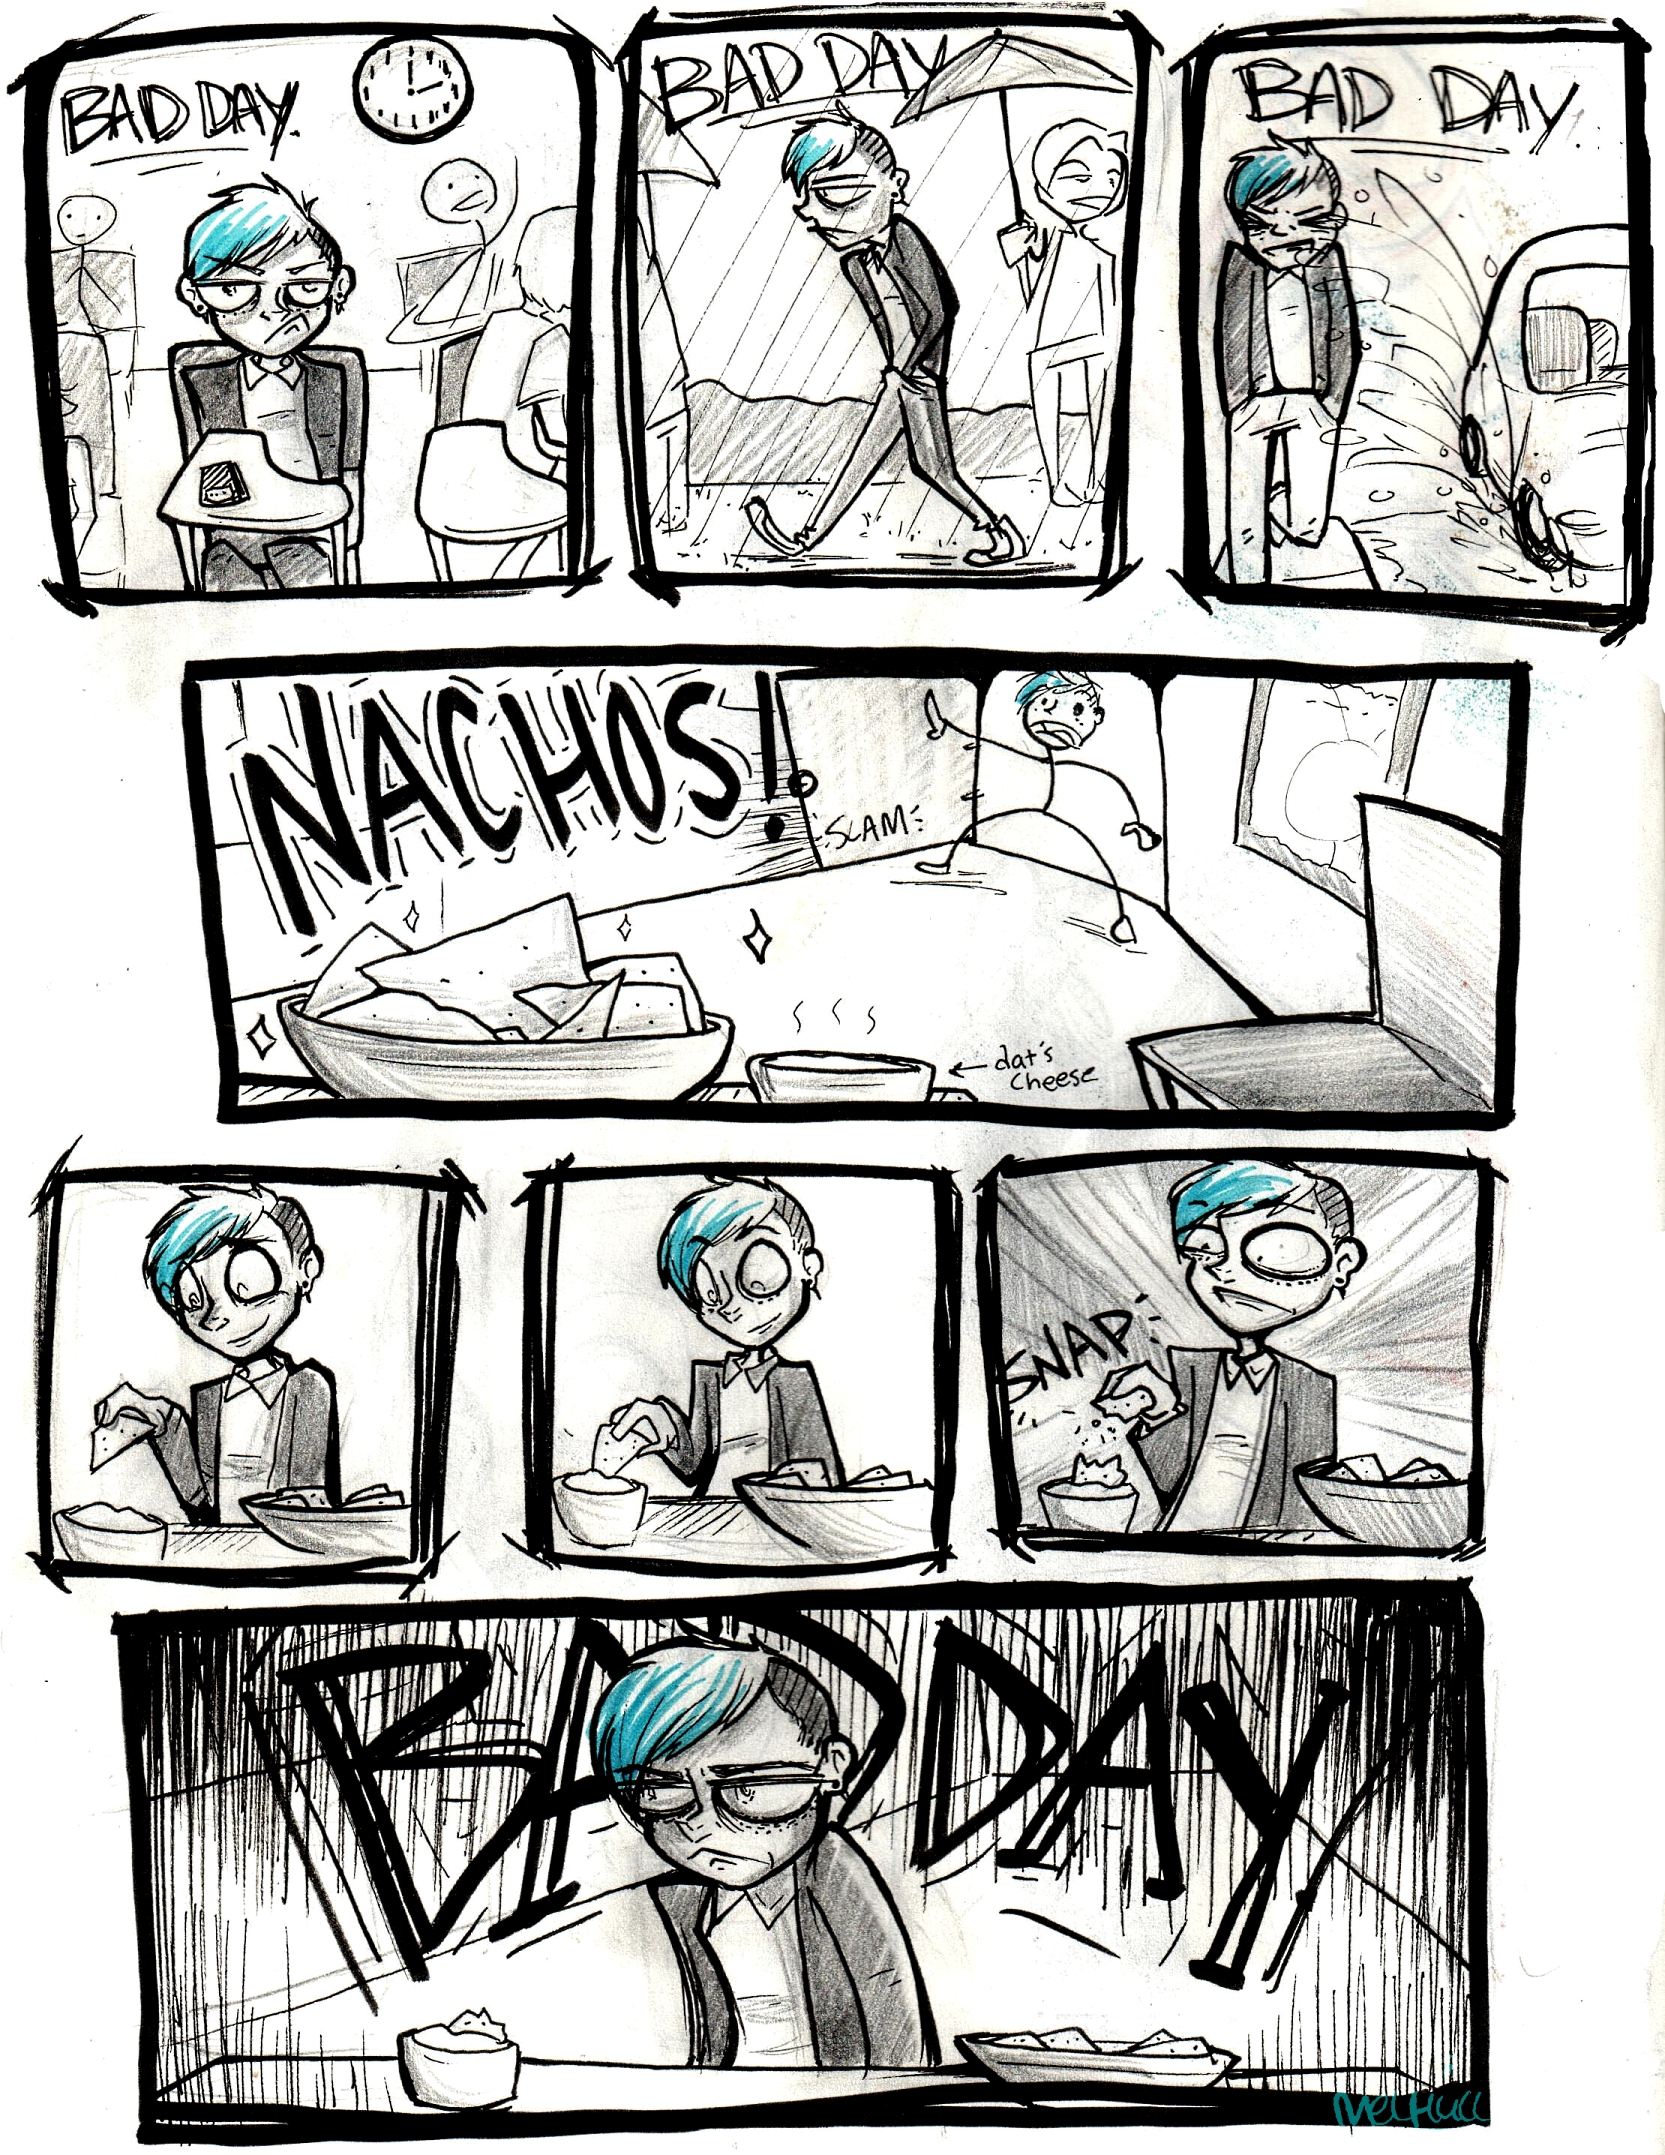 True Story by starblinx